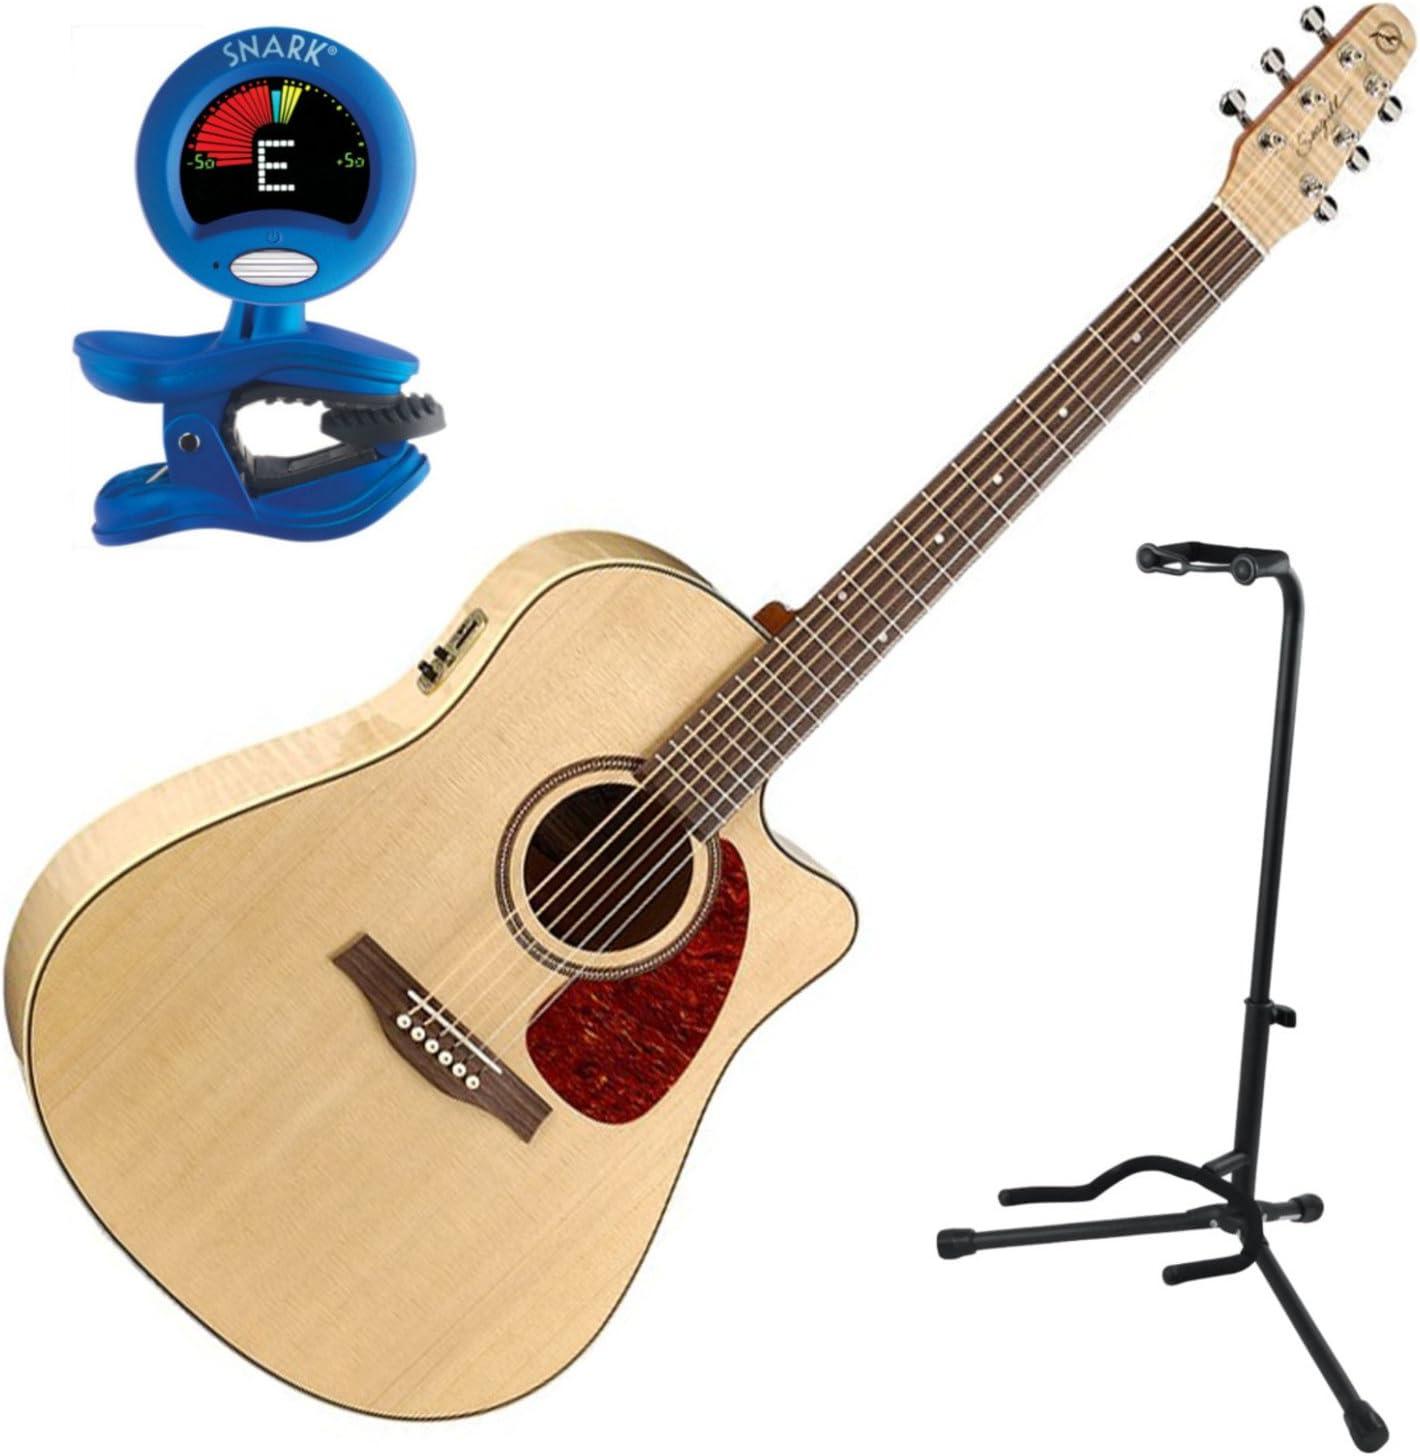 Godin guitarras 032464 Bundle Electroacústica guitarra: Amazon.es ...